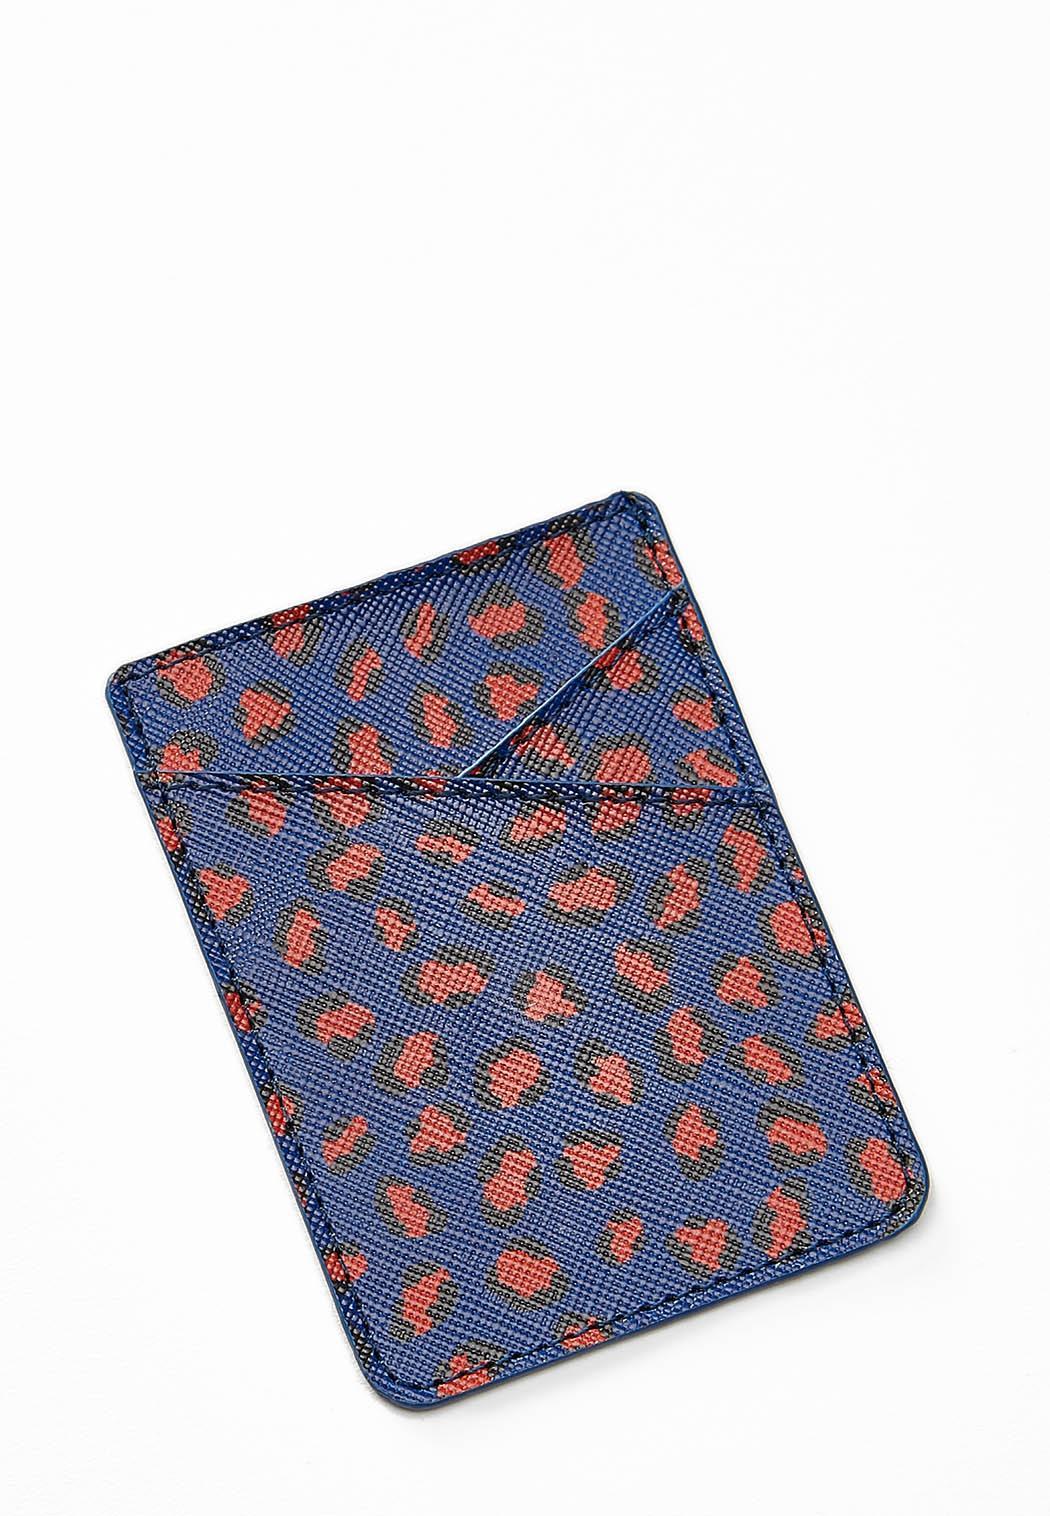 Animal Phone Wallet